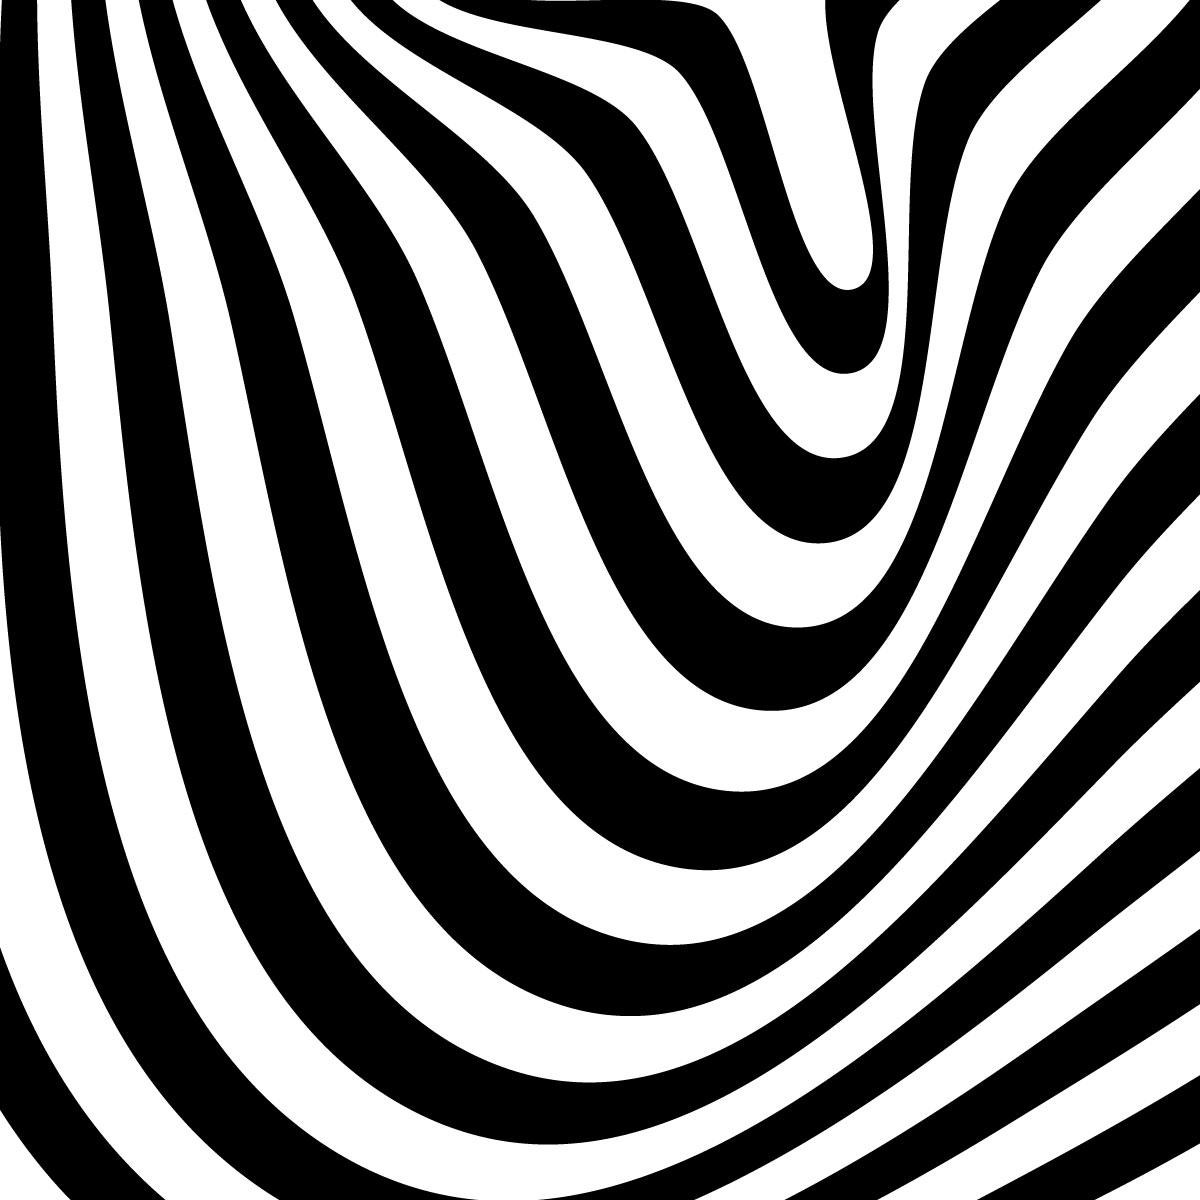 Stickers Muraux Design Sticker Mural Illusion Doptique